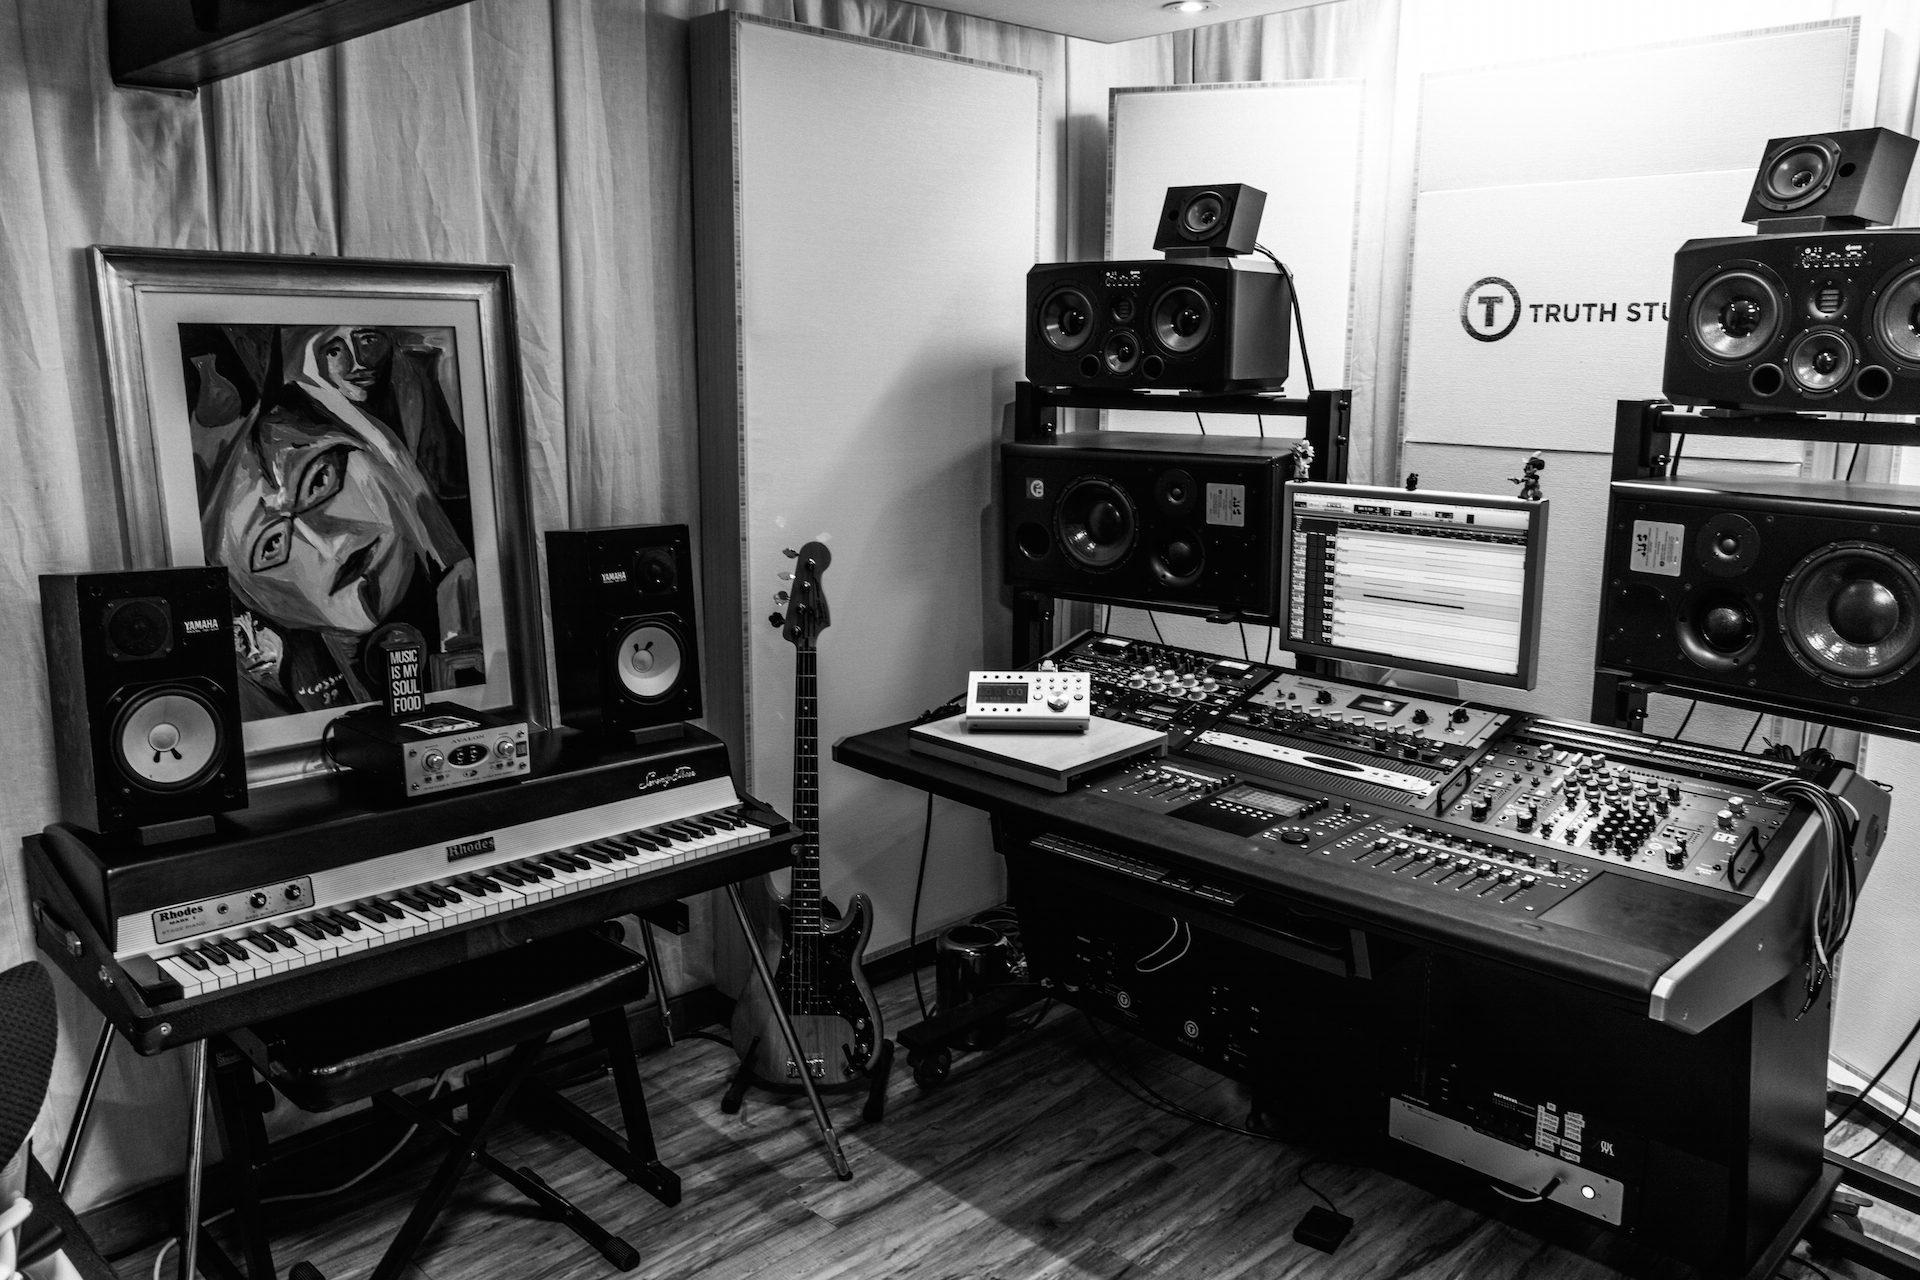 Truth Studios Los Angeles August 2016